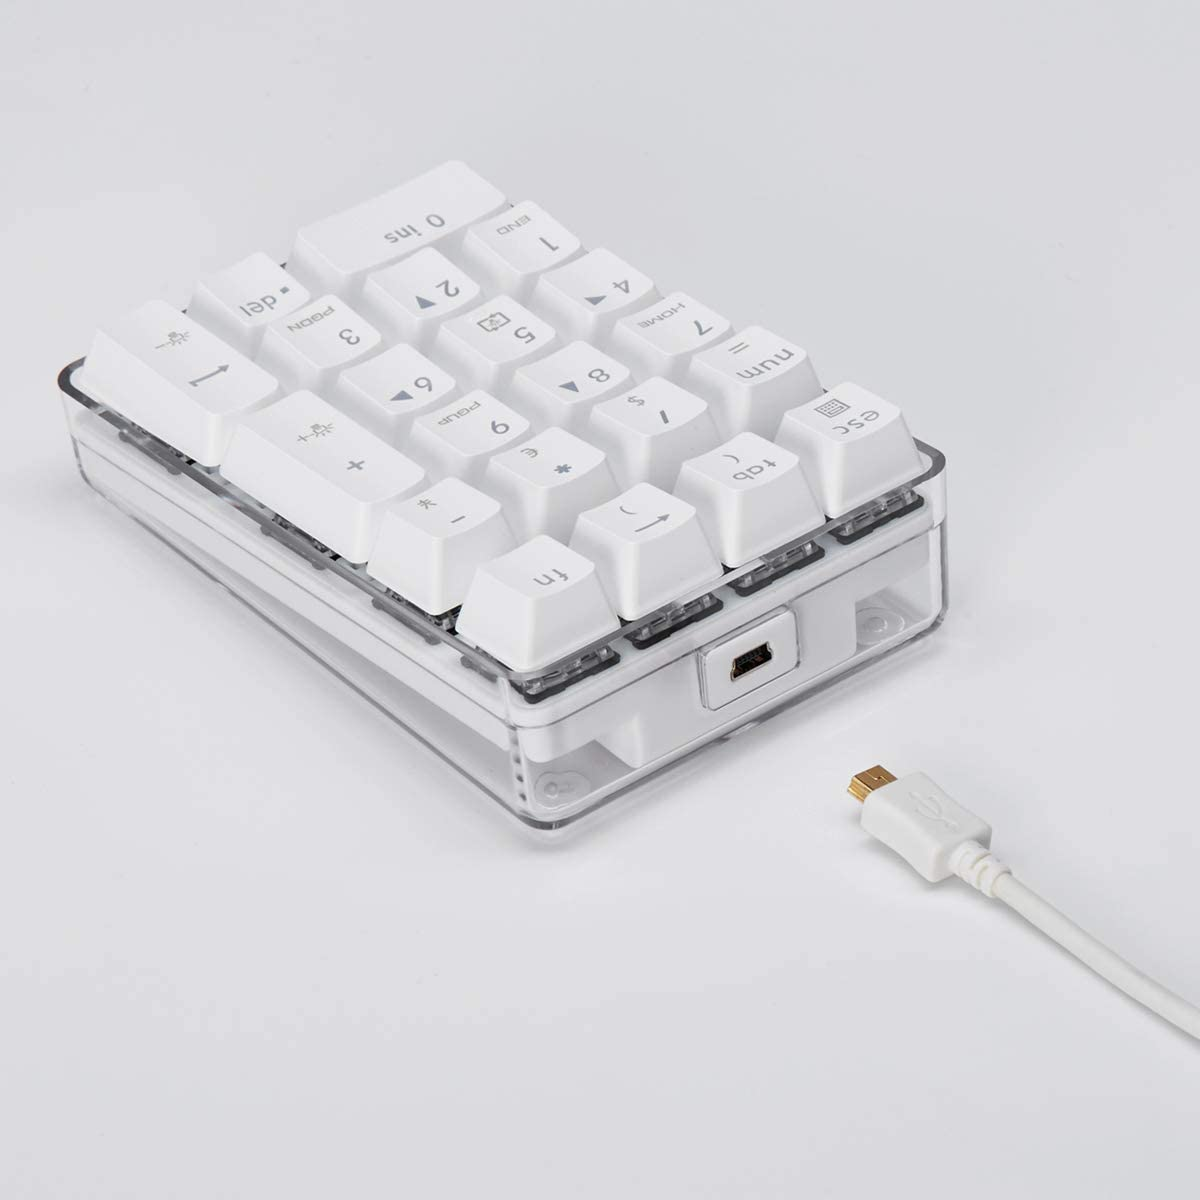 Mechanical Numeric Keypad Brown Switch Gaming Keypad 21 Keys Mini Numpad Portable Keypad Wired Number Pad for iMac Laptop PC MacBook Notebook